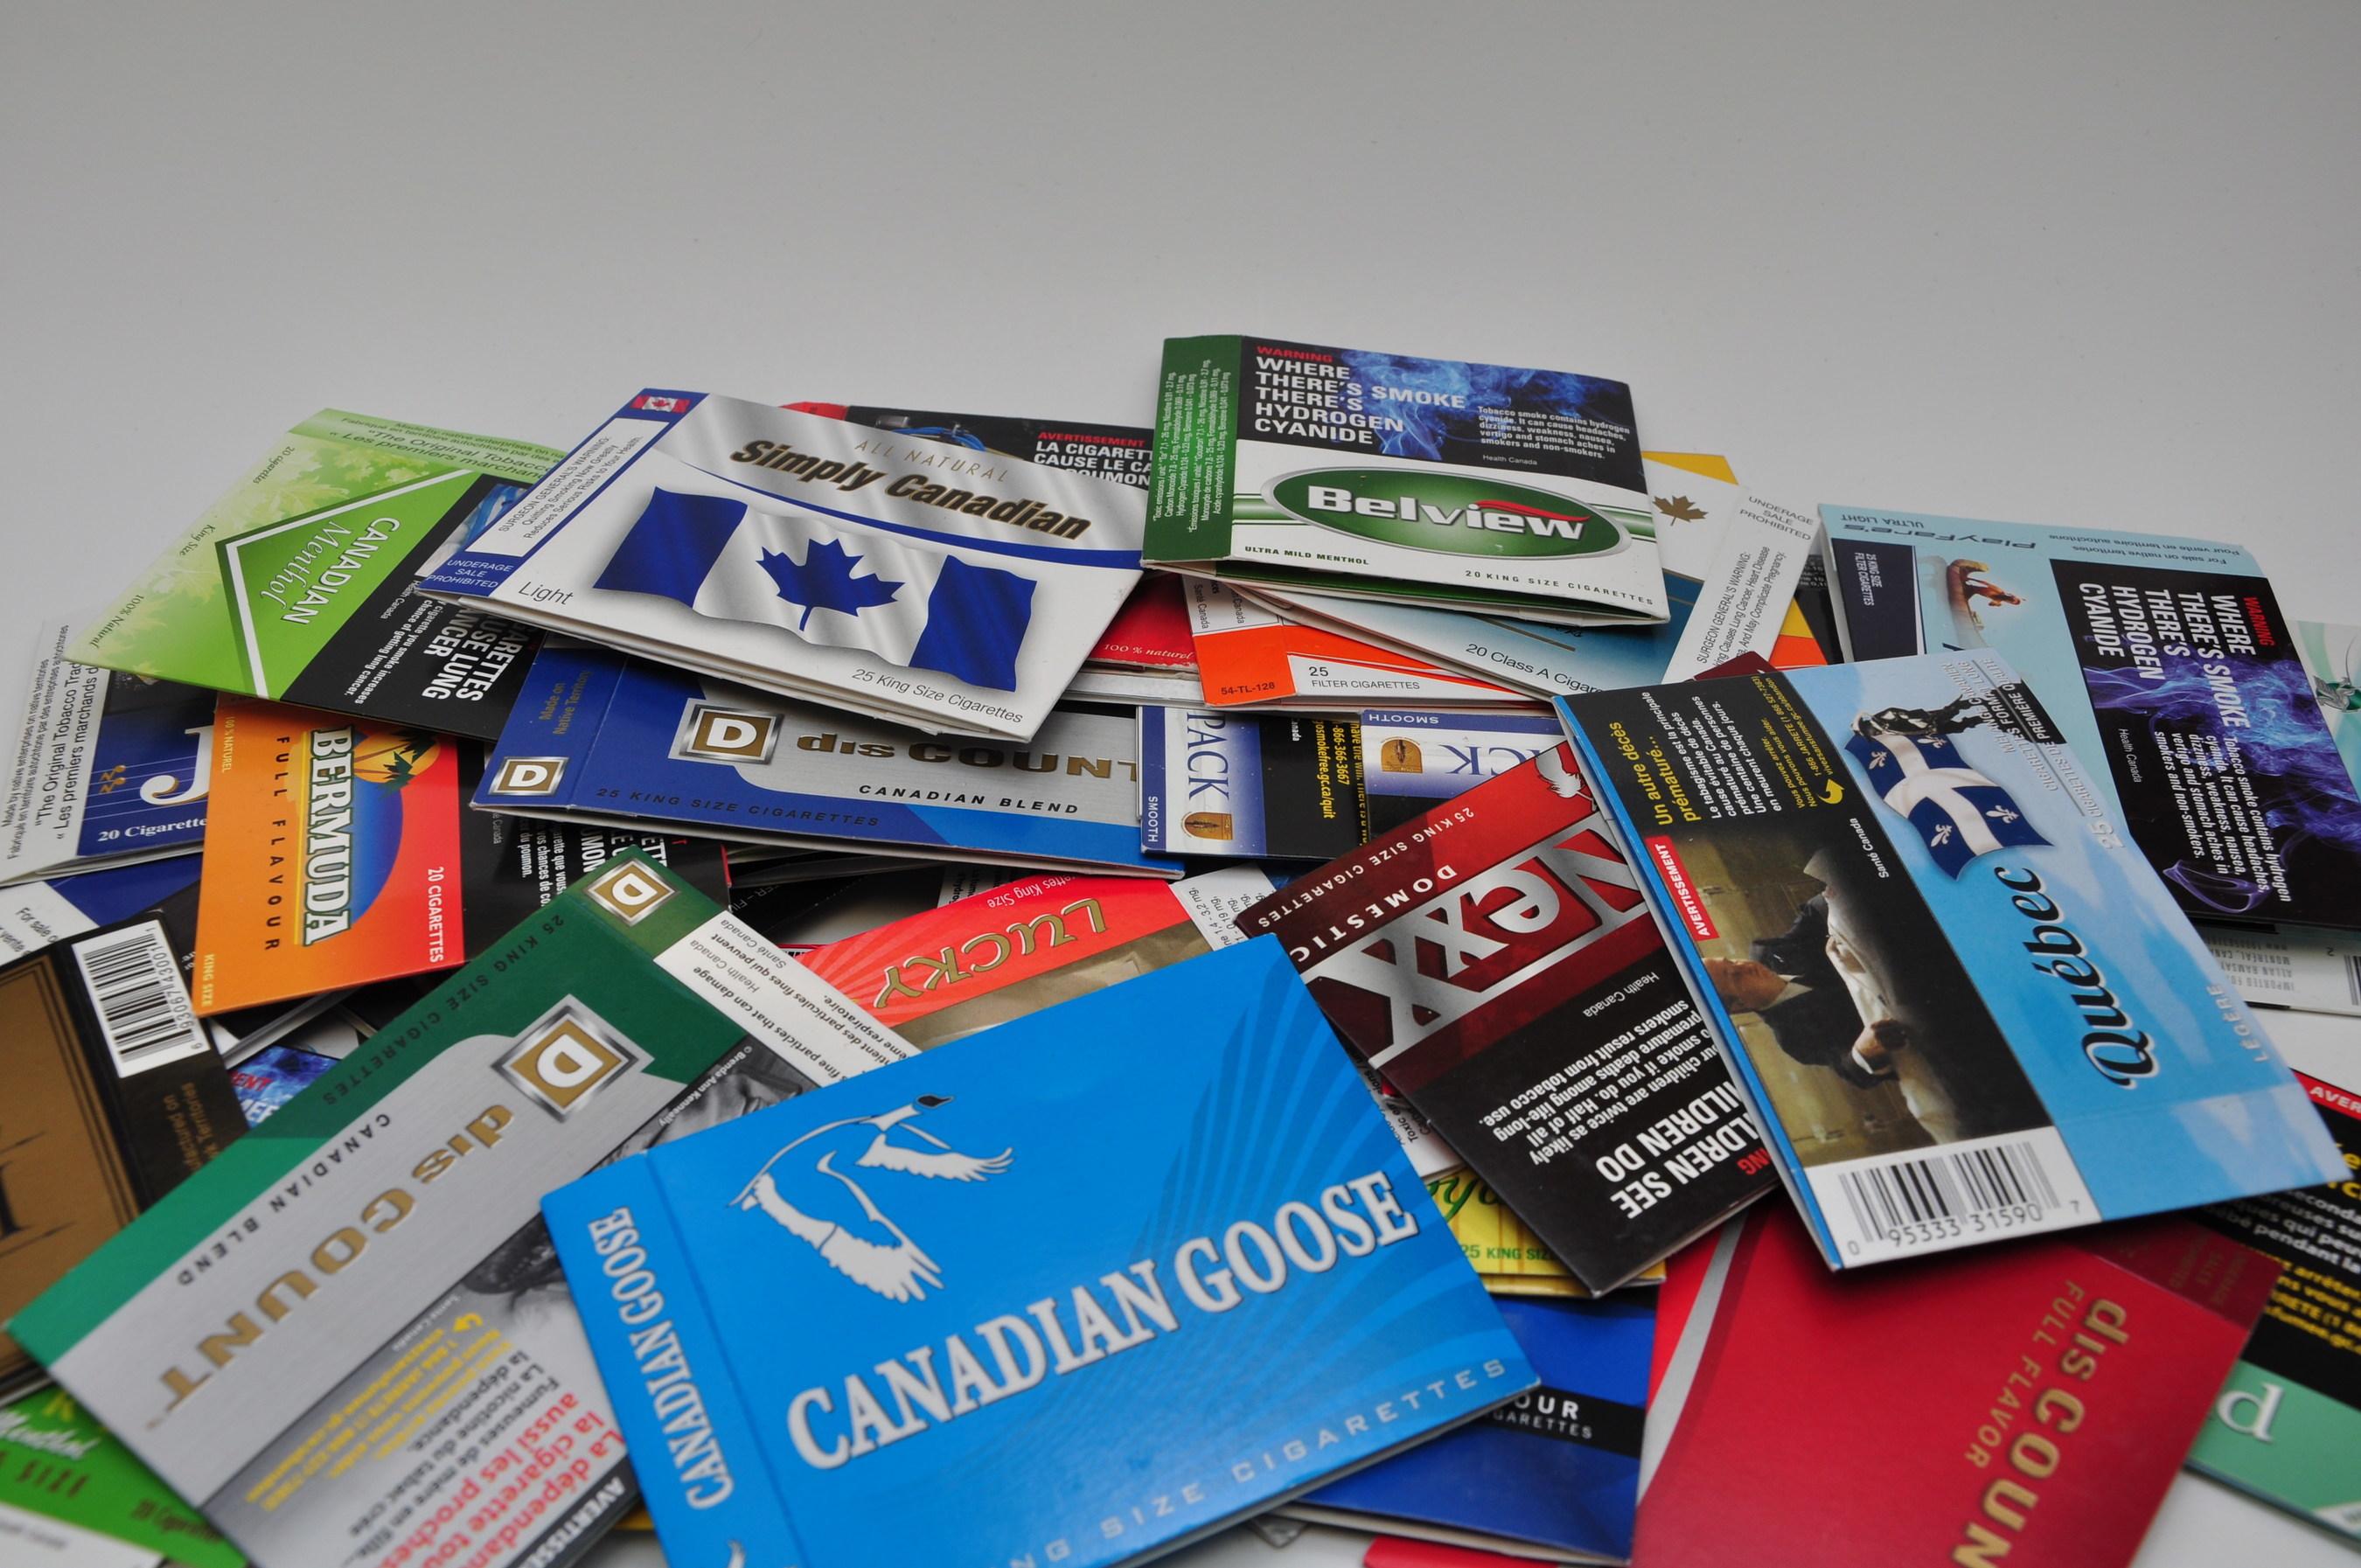 Menthol cigarettes ban ontario buy silk cut cigarettes uk